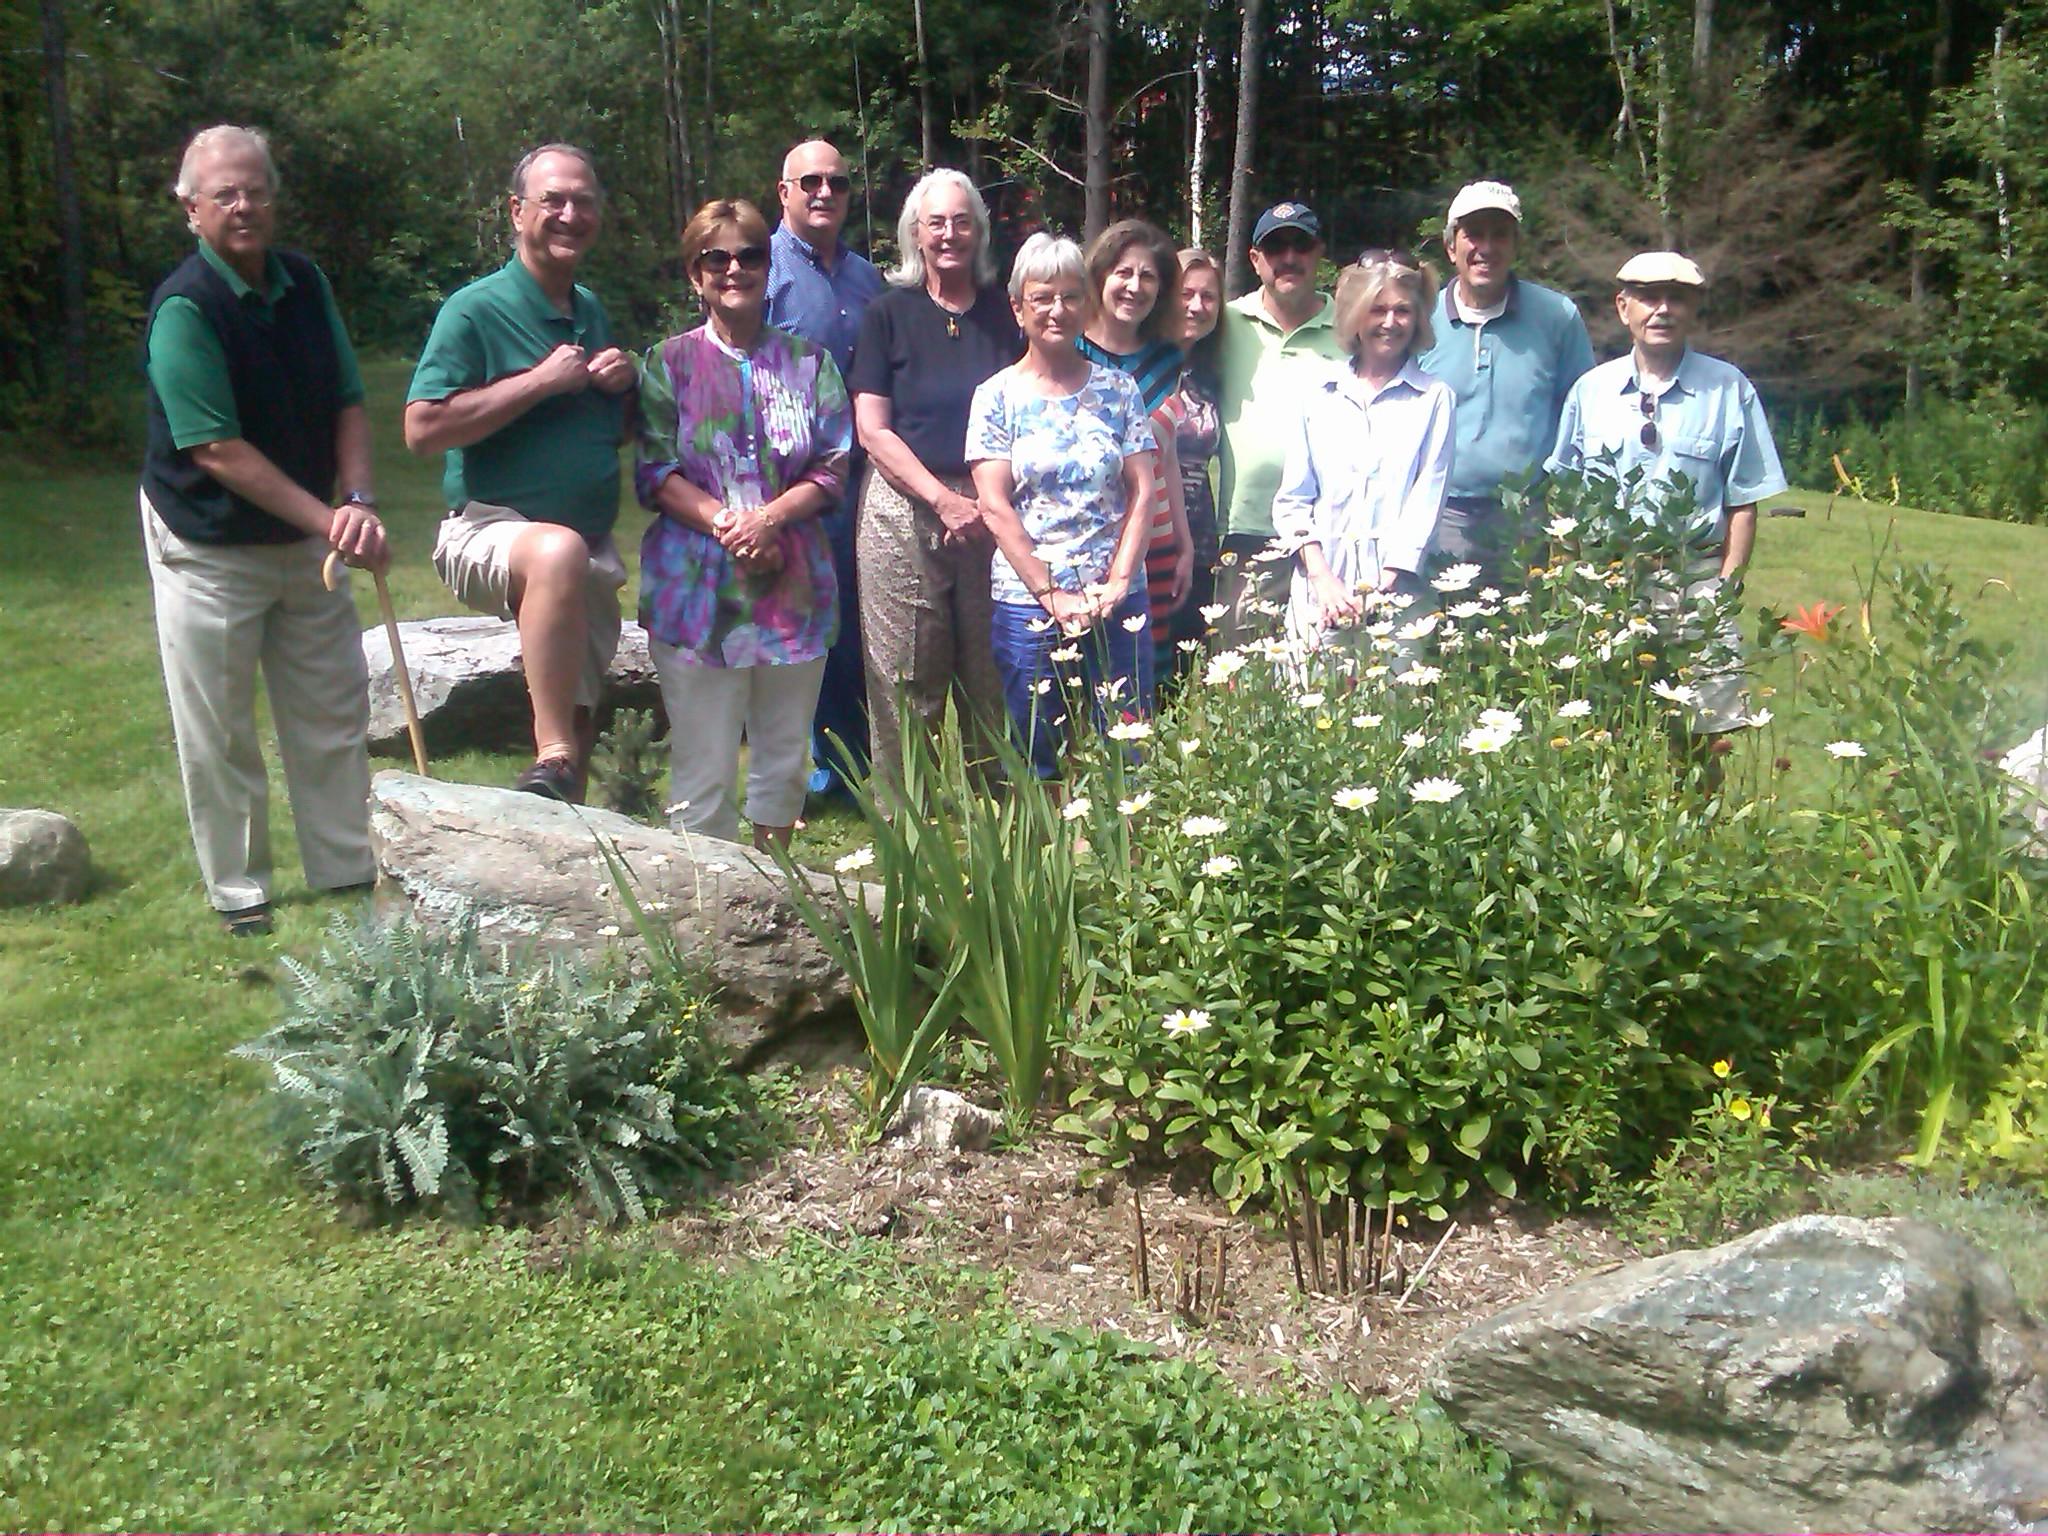 Alumni gather in Vermont on August 19, 2012